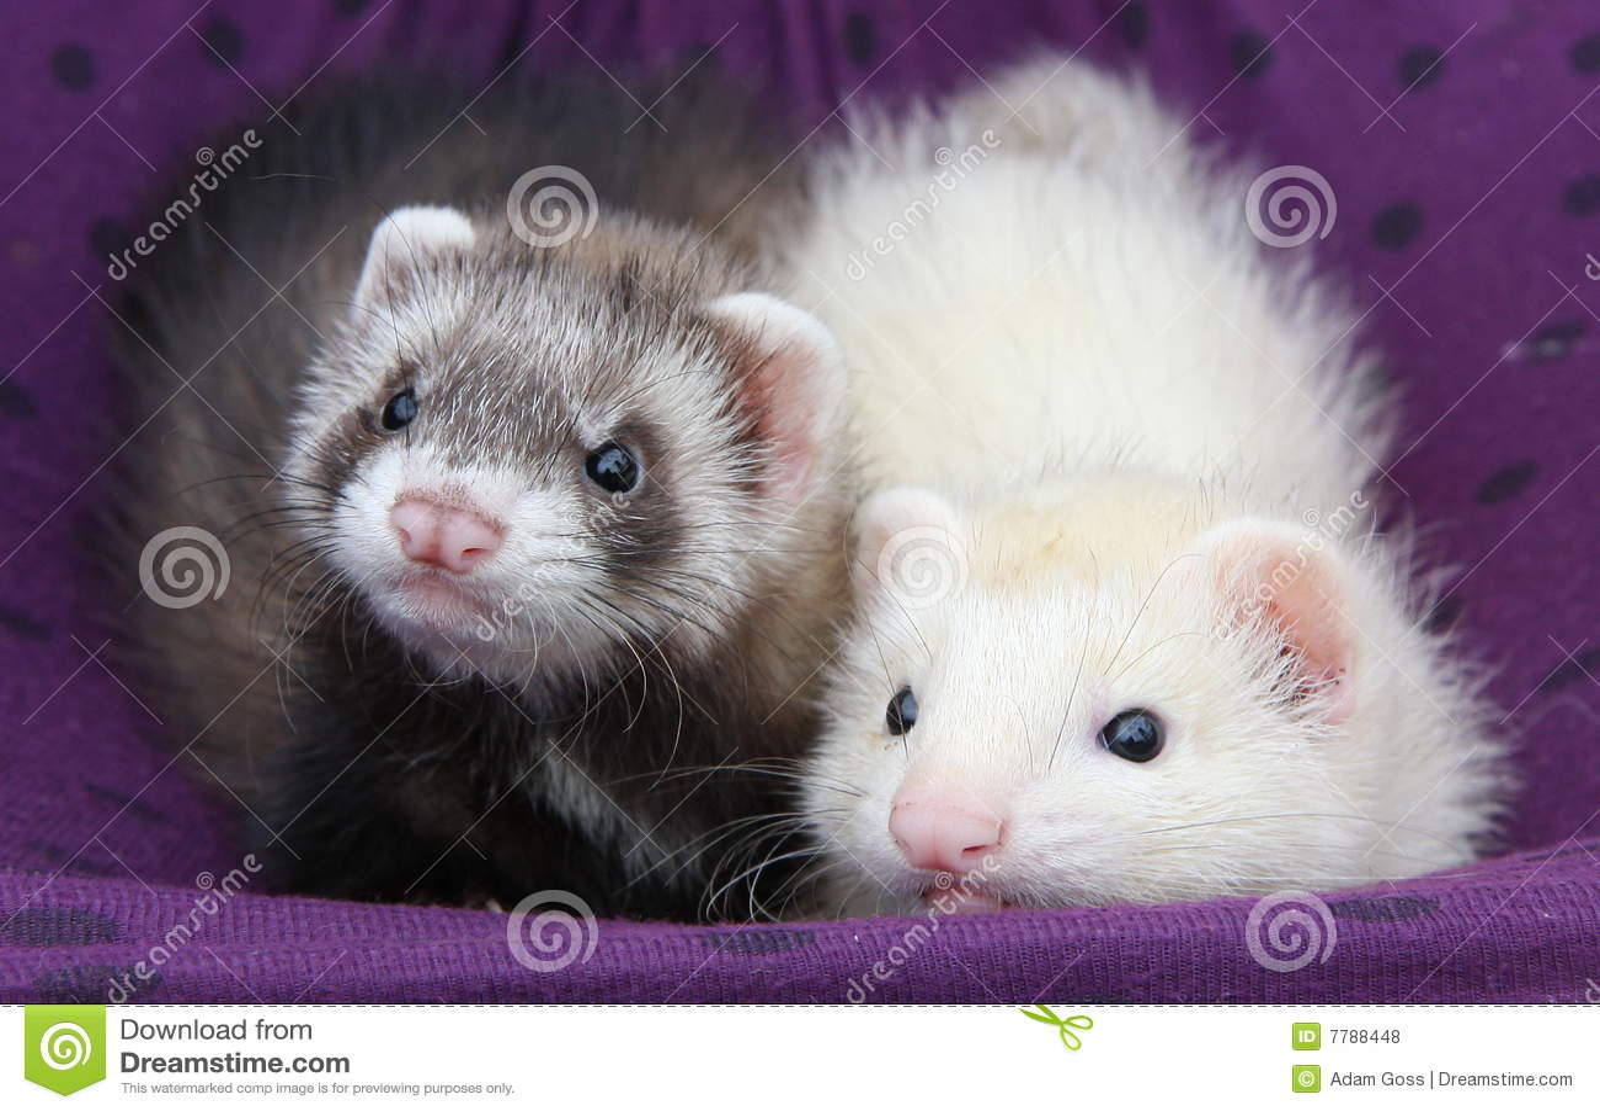 Ferret Babies Royalty Free Stock Photos Image 7788448